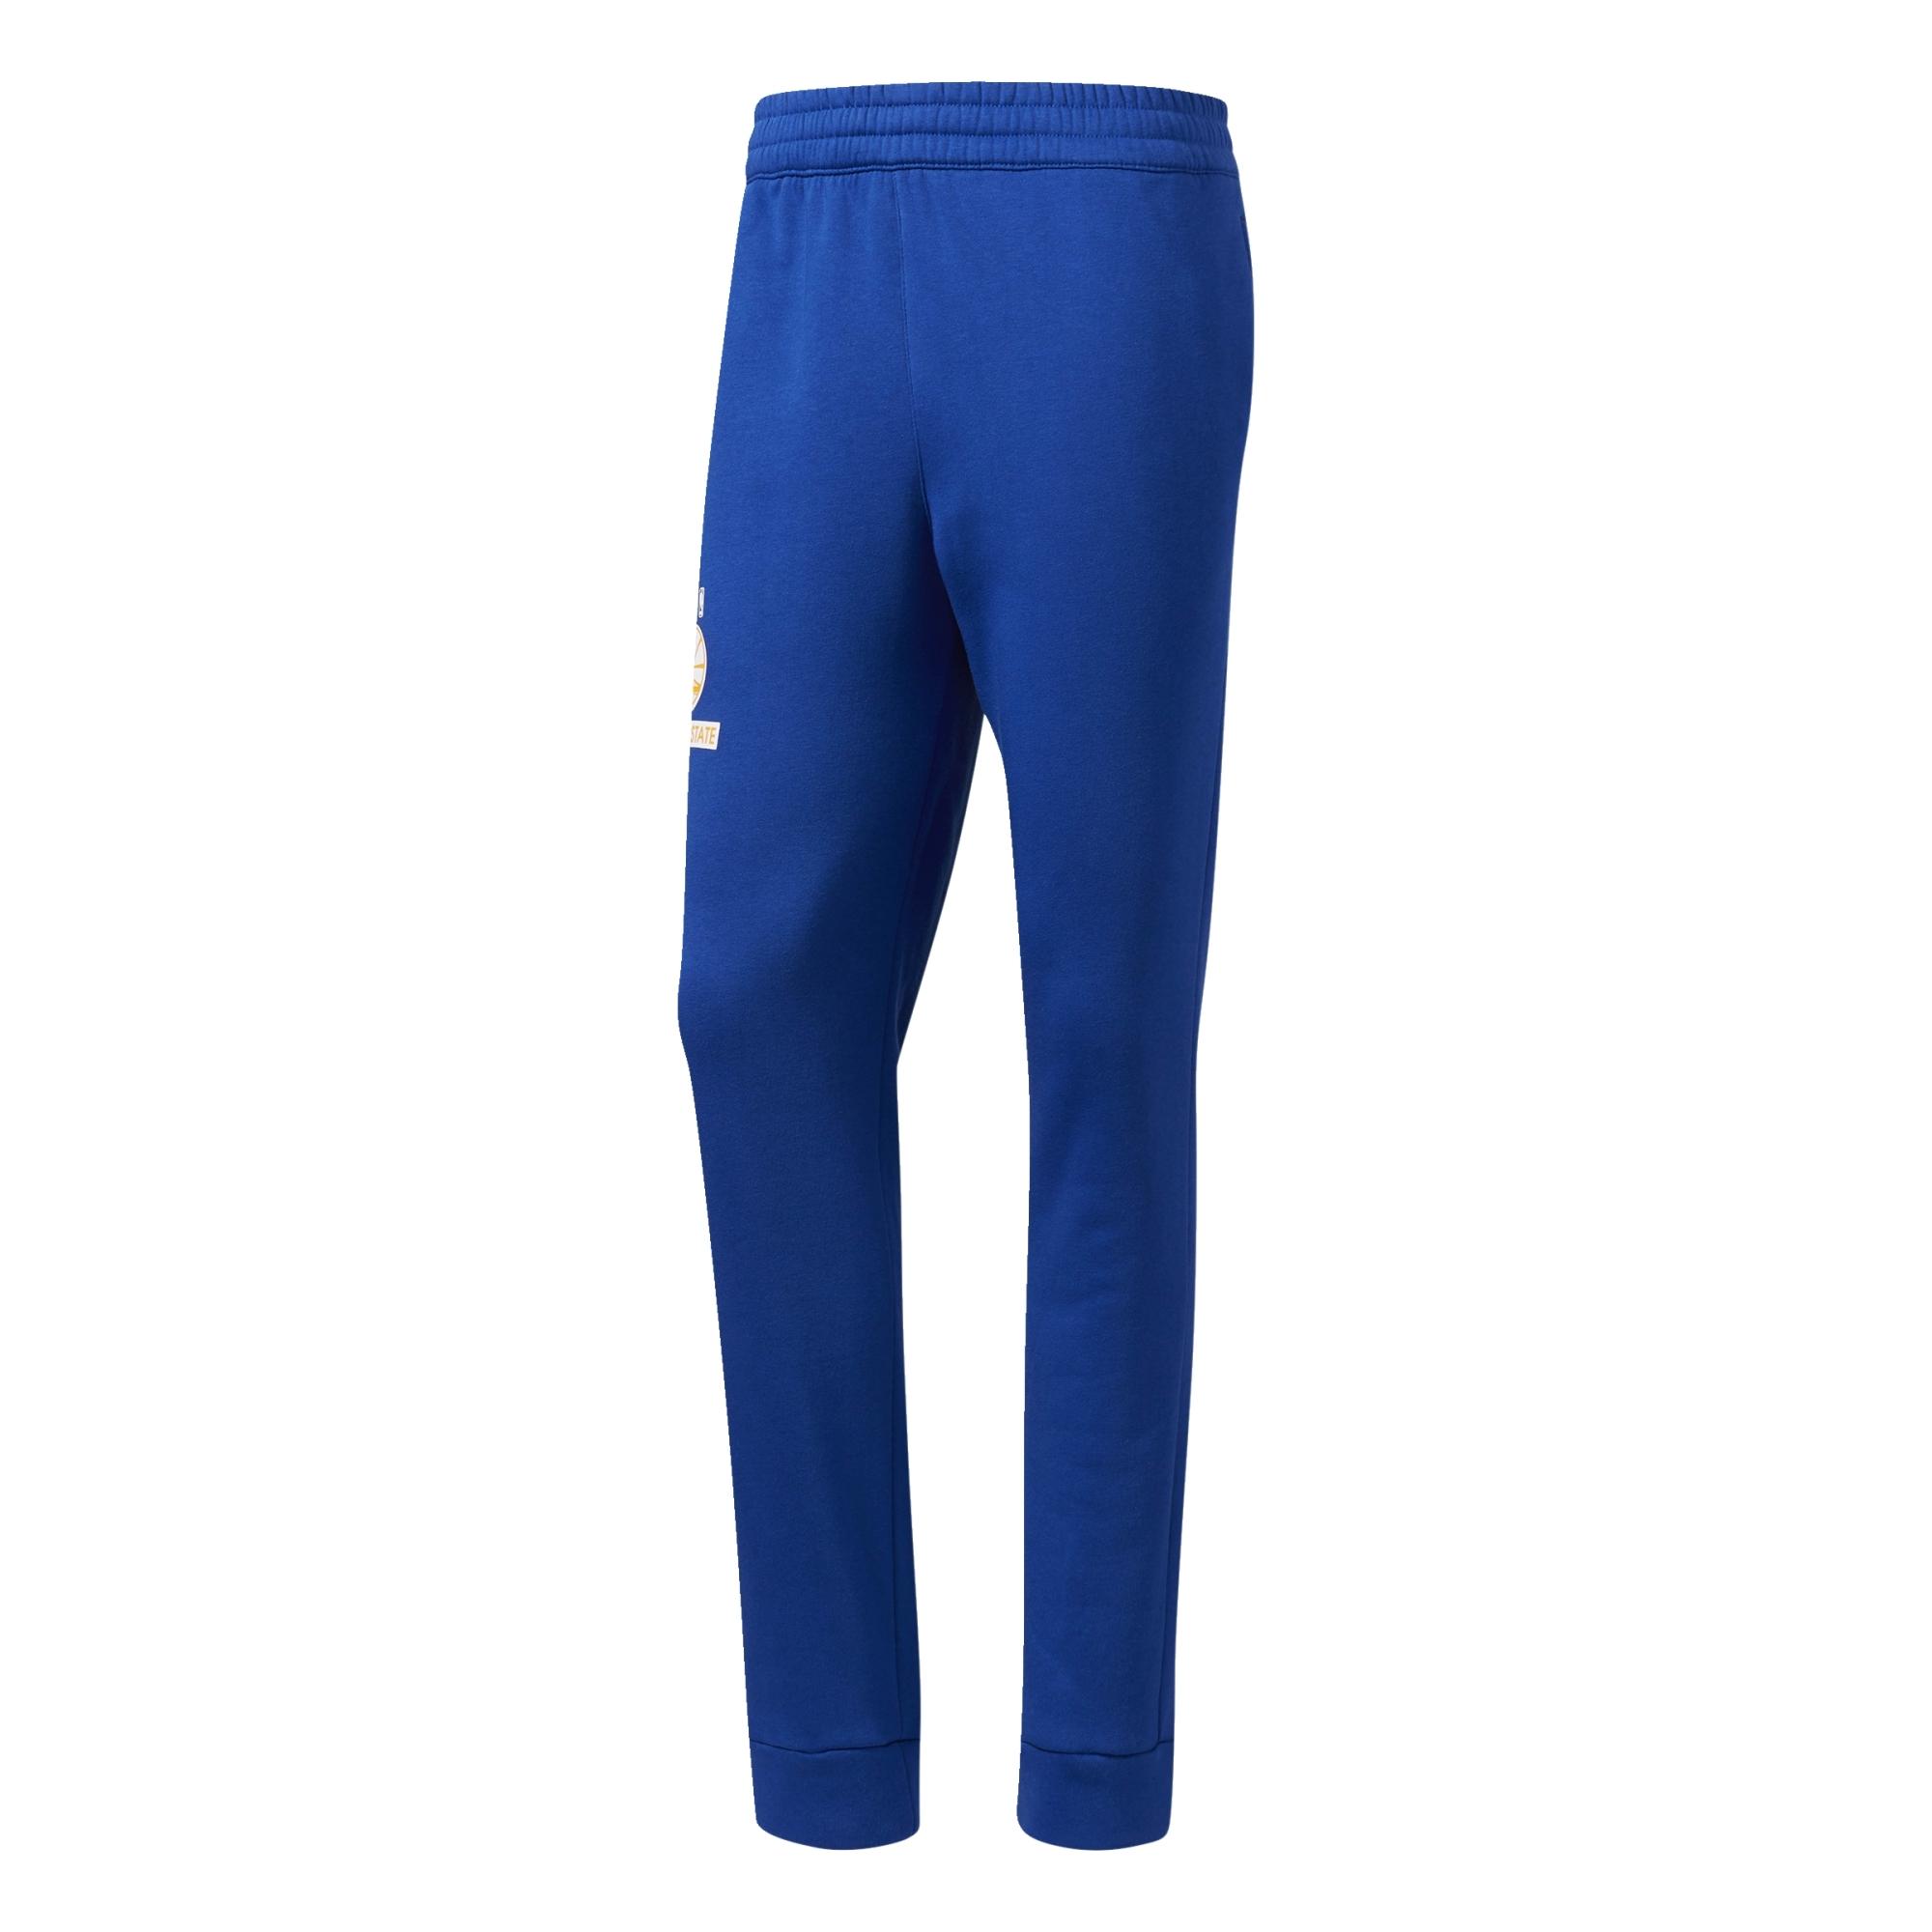 Adidas NBA Golden State Warriors Fanwear Pants (blue) 6d14ae7f764